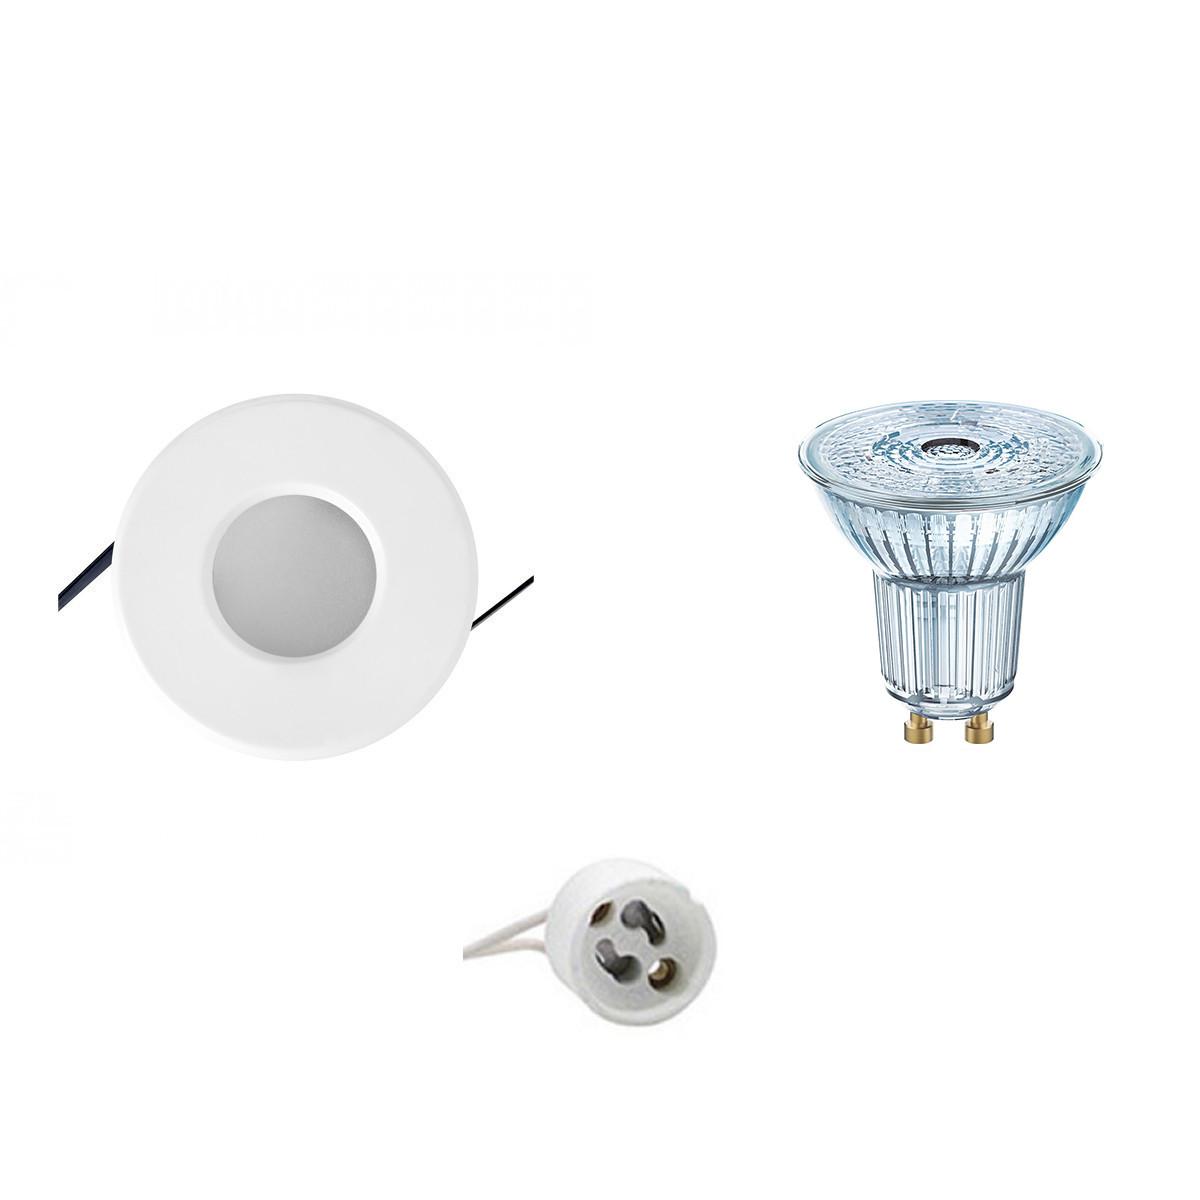 OSRAM - LED Spot Set - Parathom PAR16 930 36D - GU10 Fitting - Waterdicht IP65 - Dimbaar - Inbouw Ro